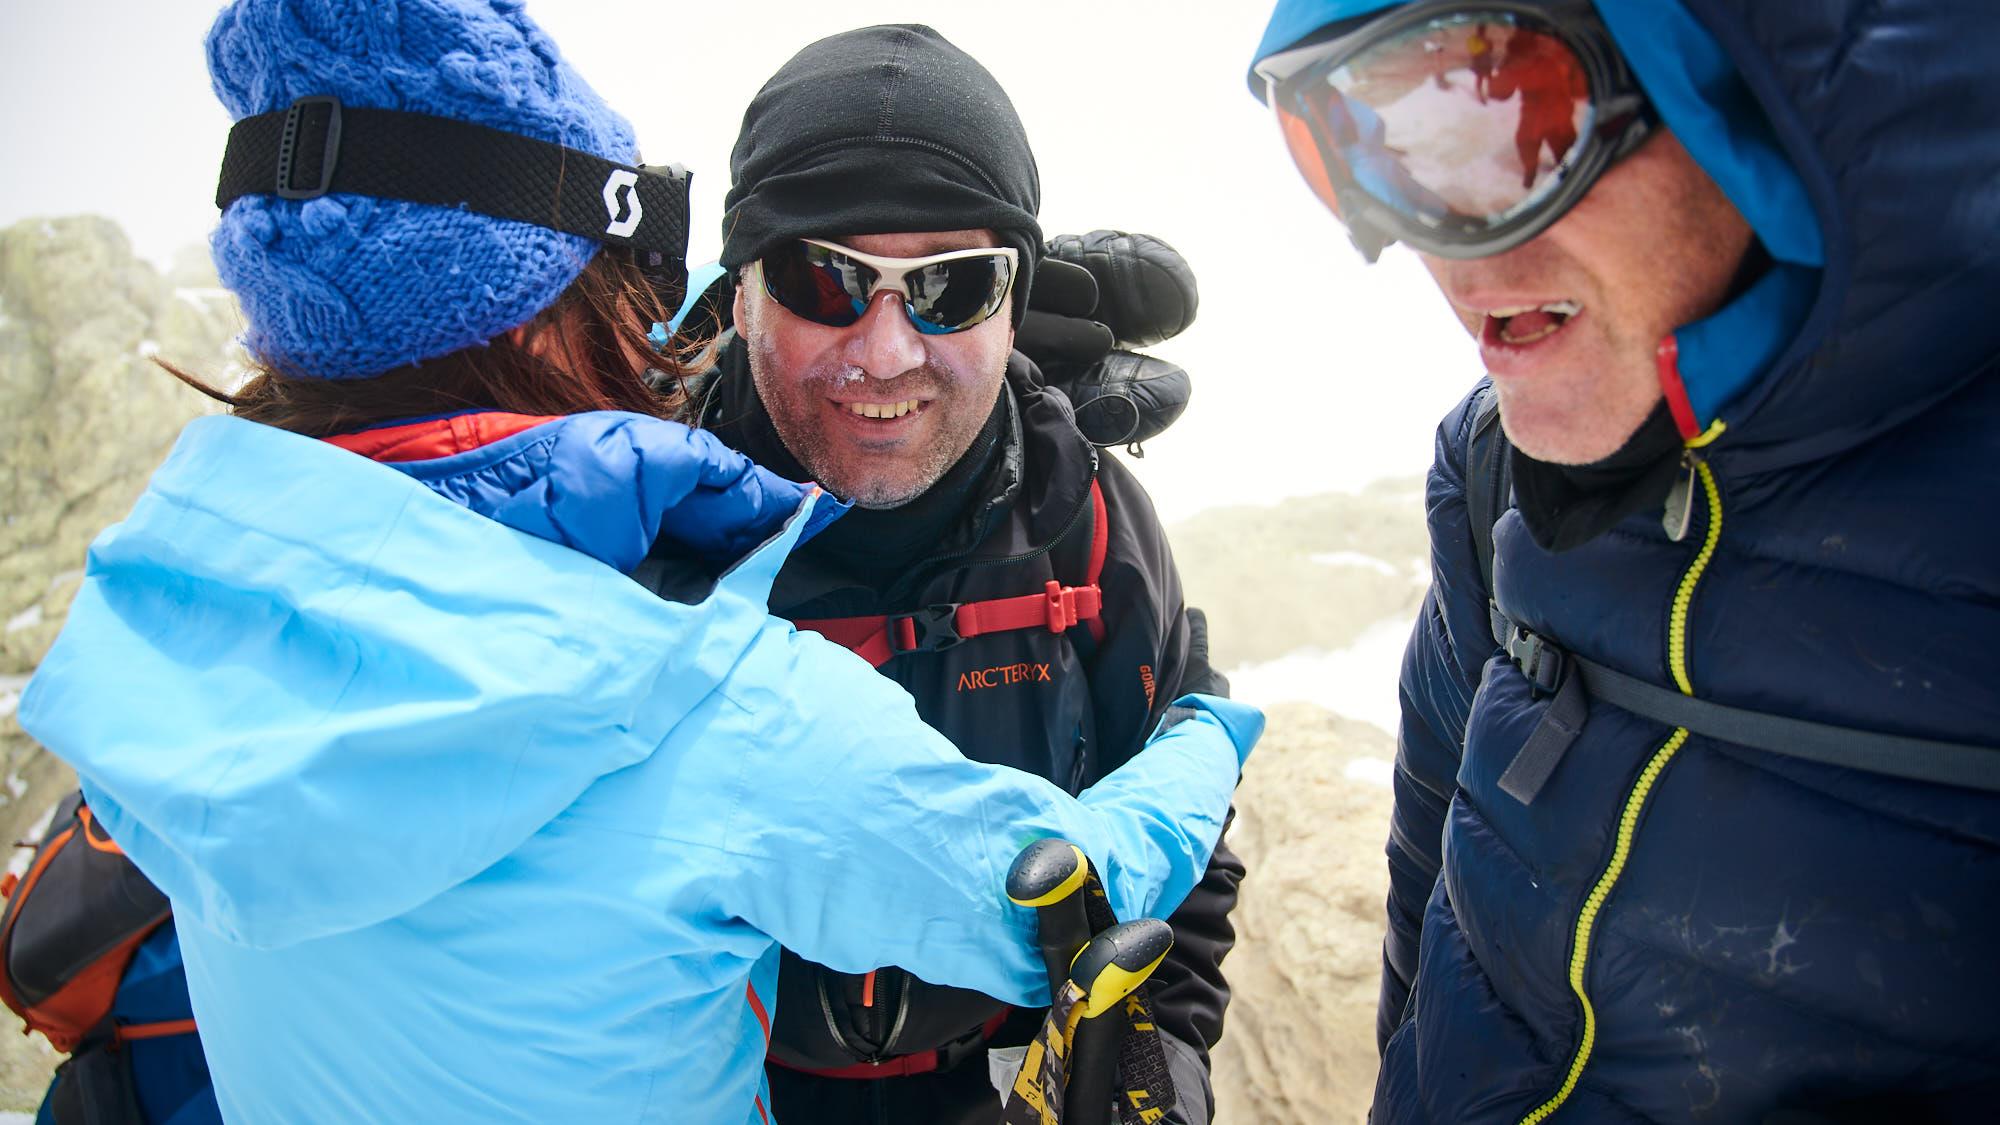 Mountaineer being welcomed on top of Mount Damavand in Iran